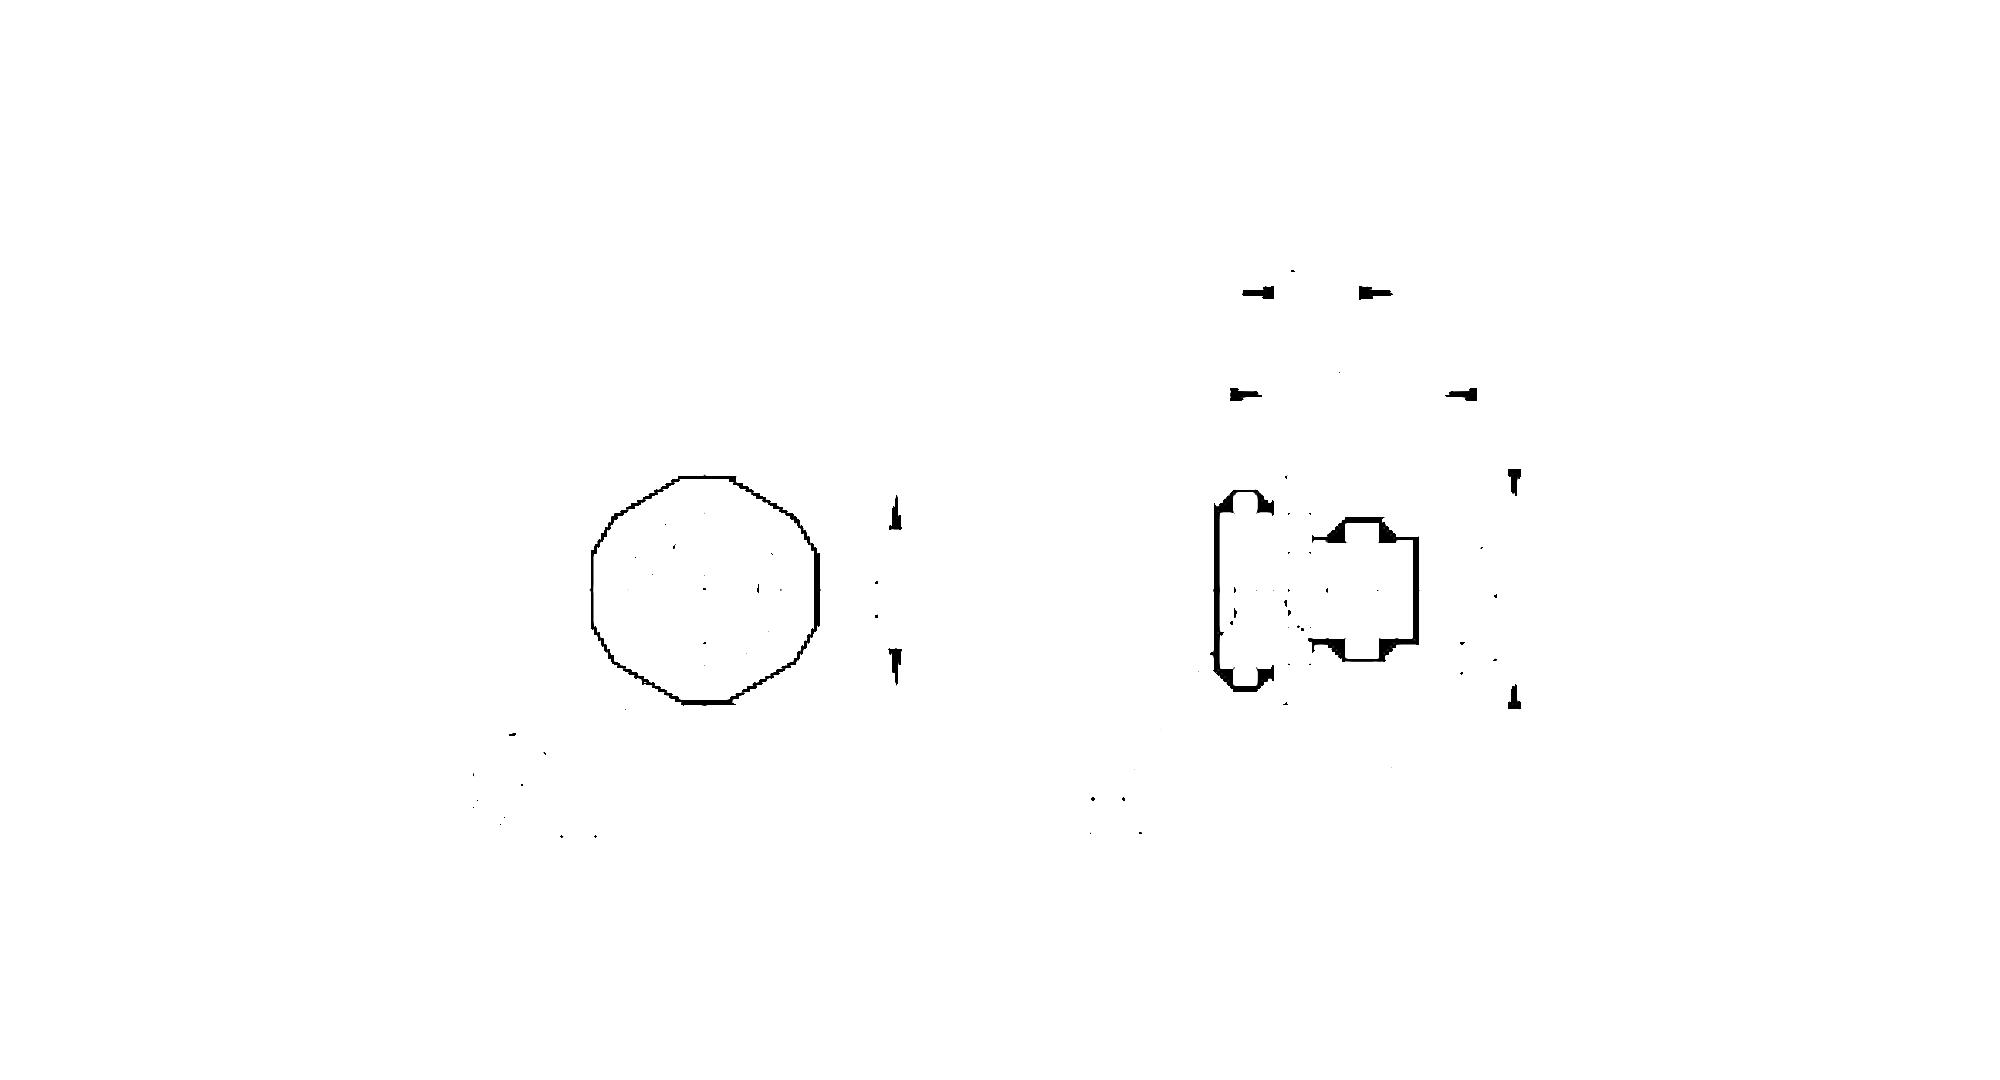 e11295 - male receptacle